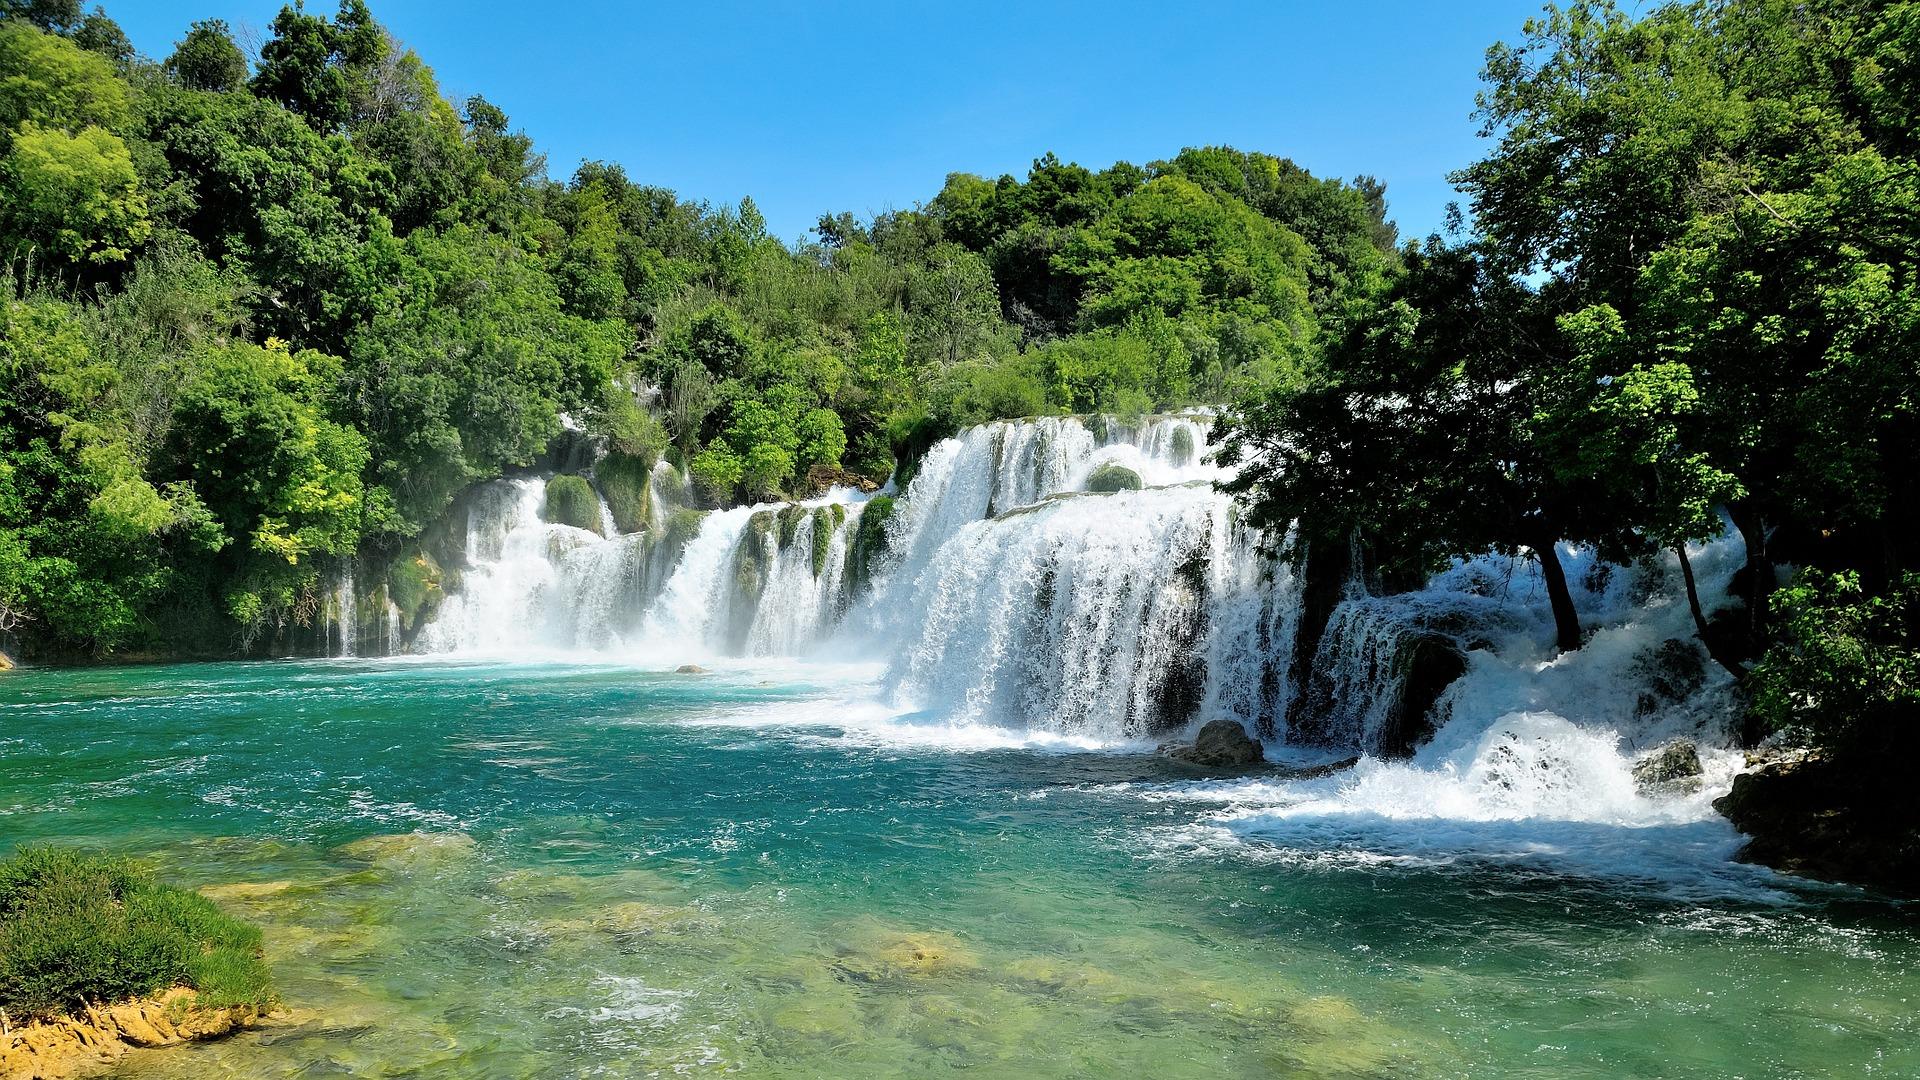 wp-content/uploads/itineraries/Croatia/croatia-krka-1.jpg